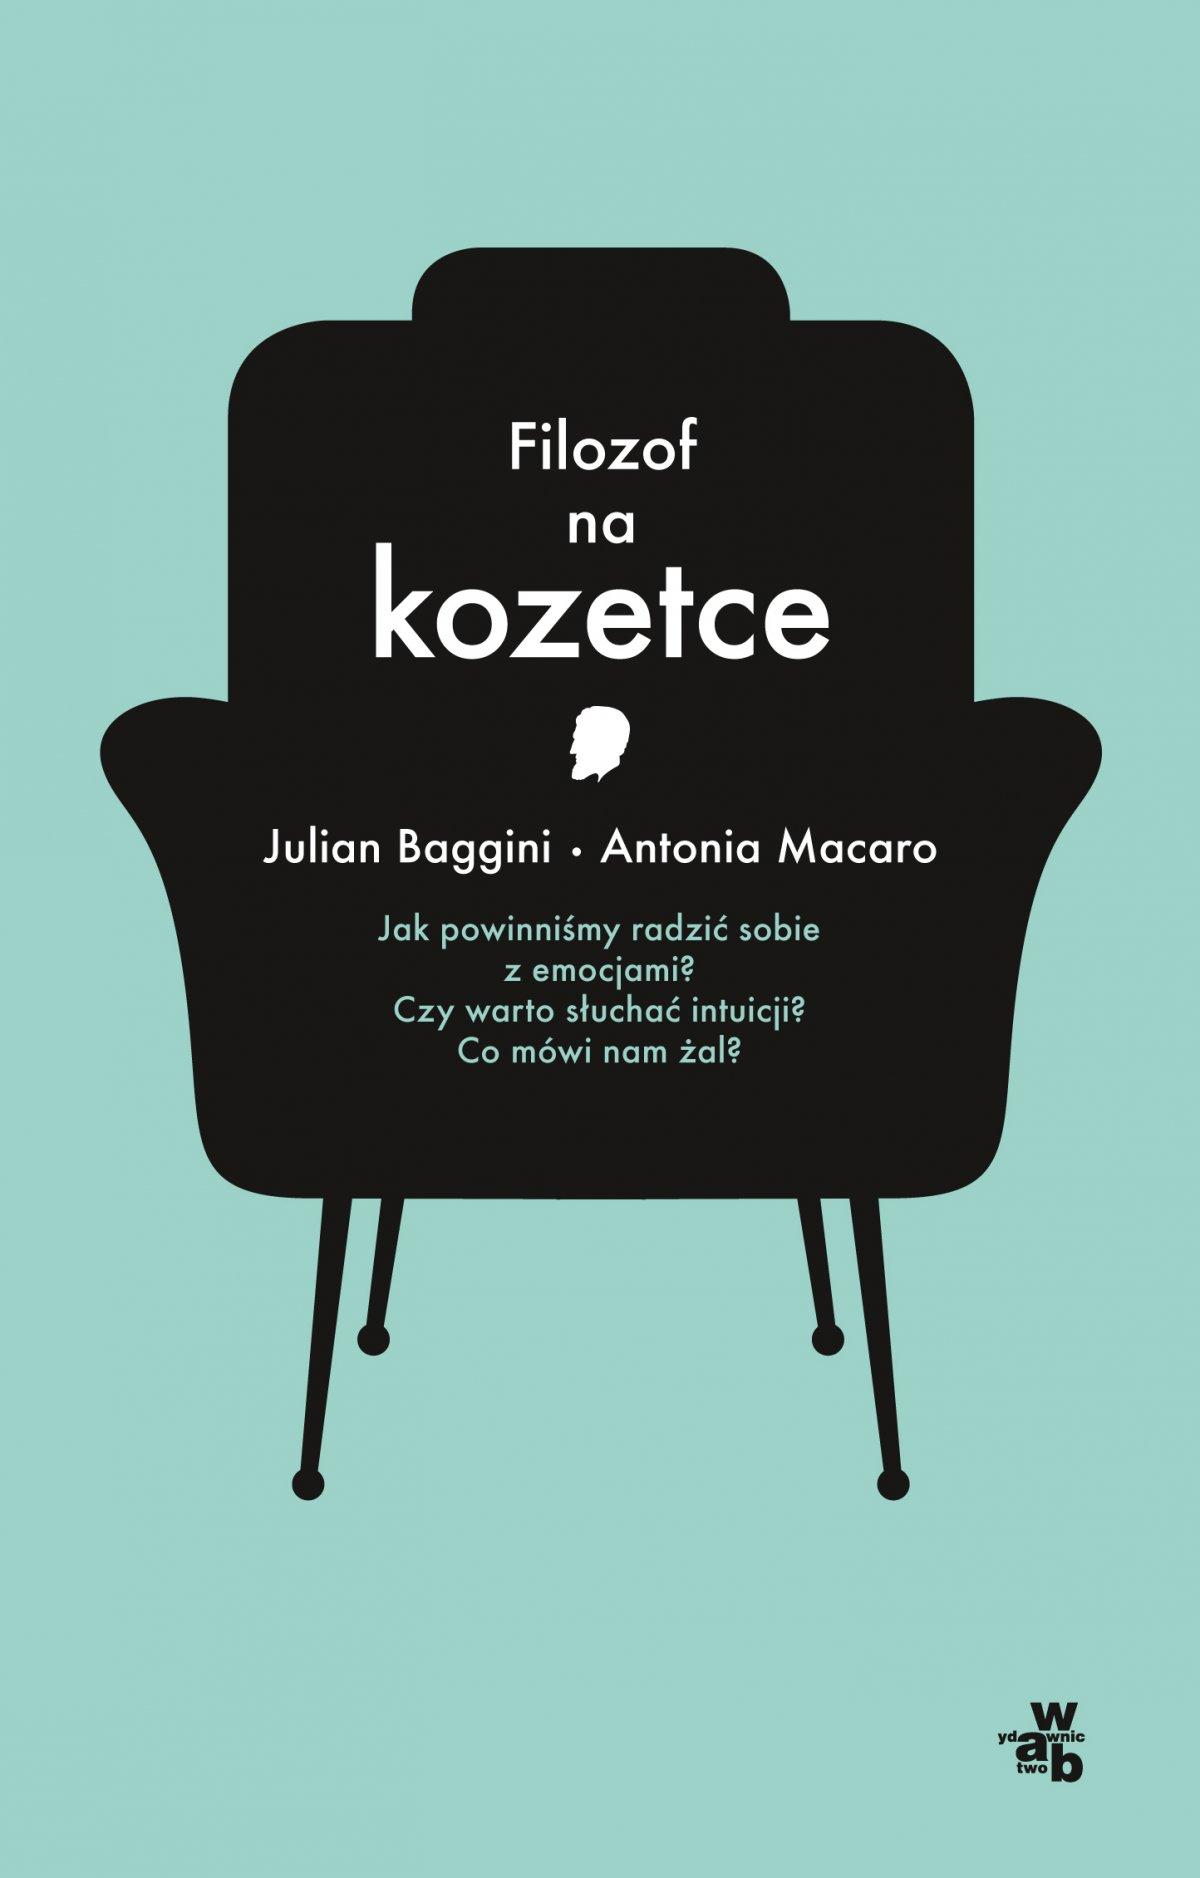 Filozof na kozetce - Julian Baggini, Antonia Macaro